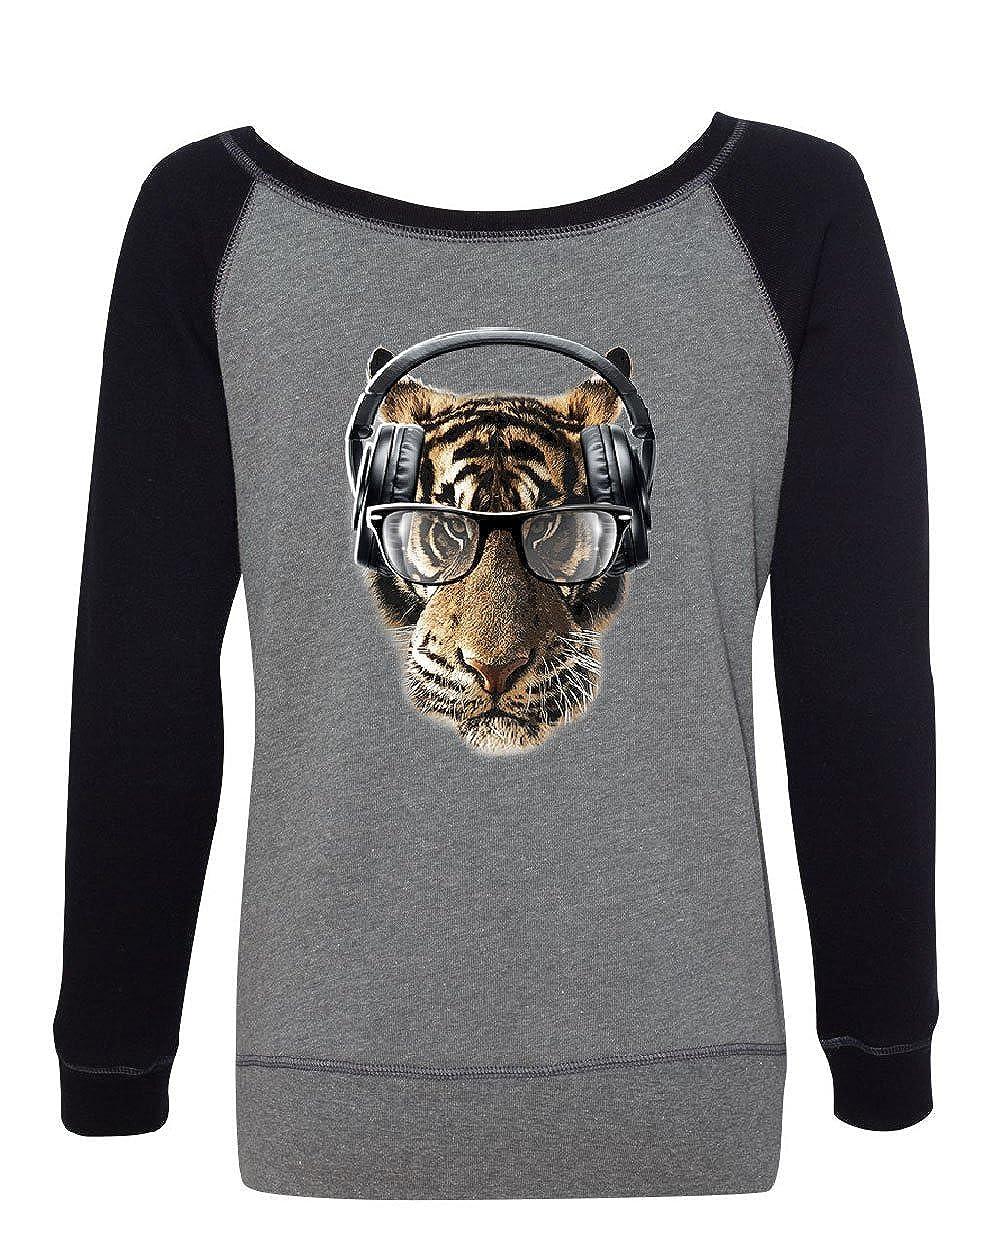 Freaky Tiger Womens Sweatshirt Music Headphones Glasses Animal DJ Party